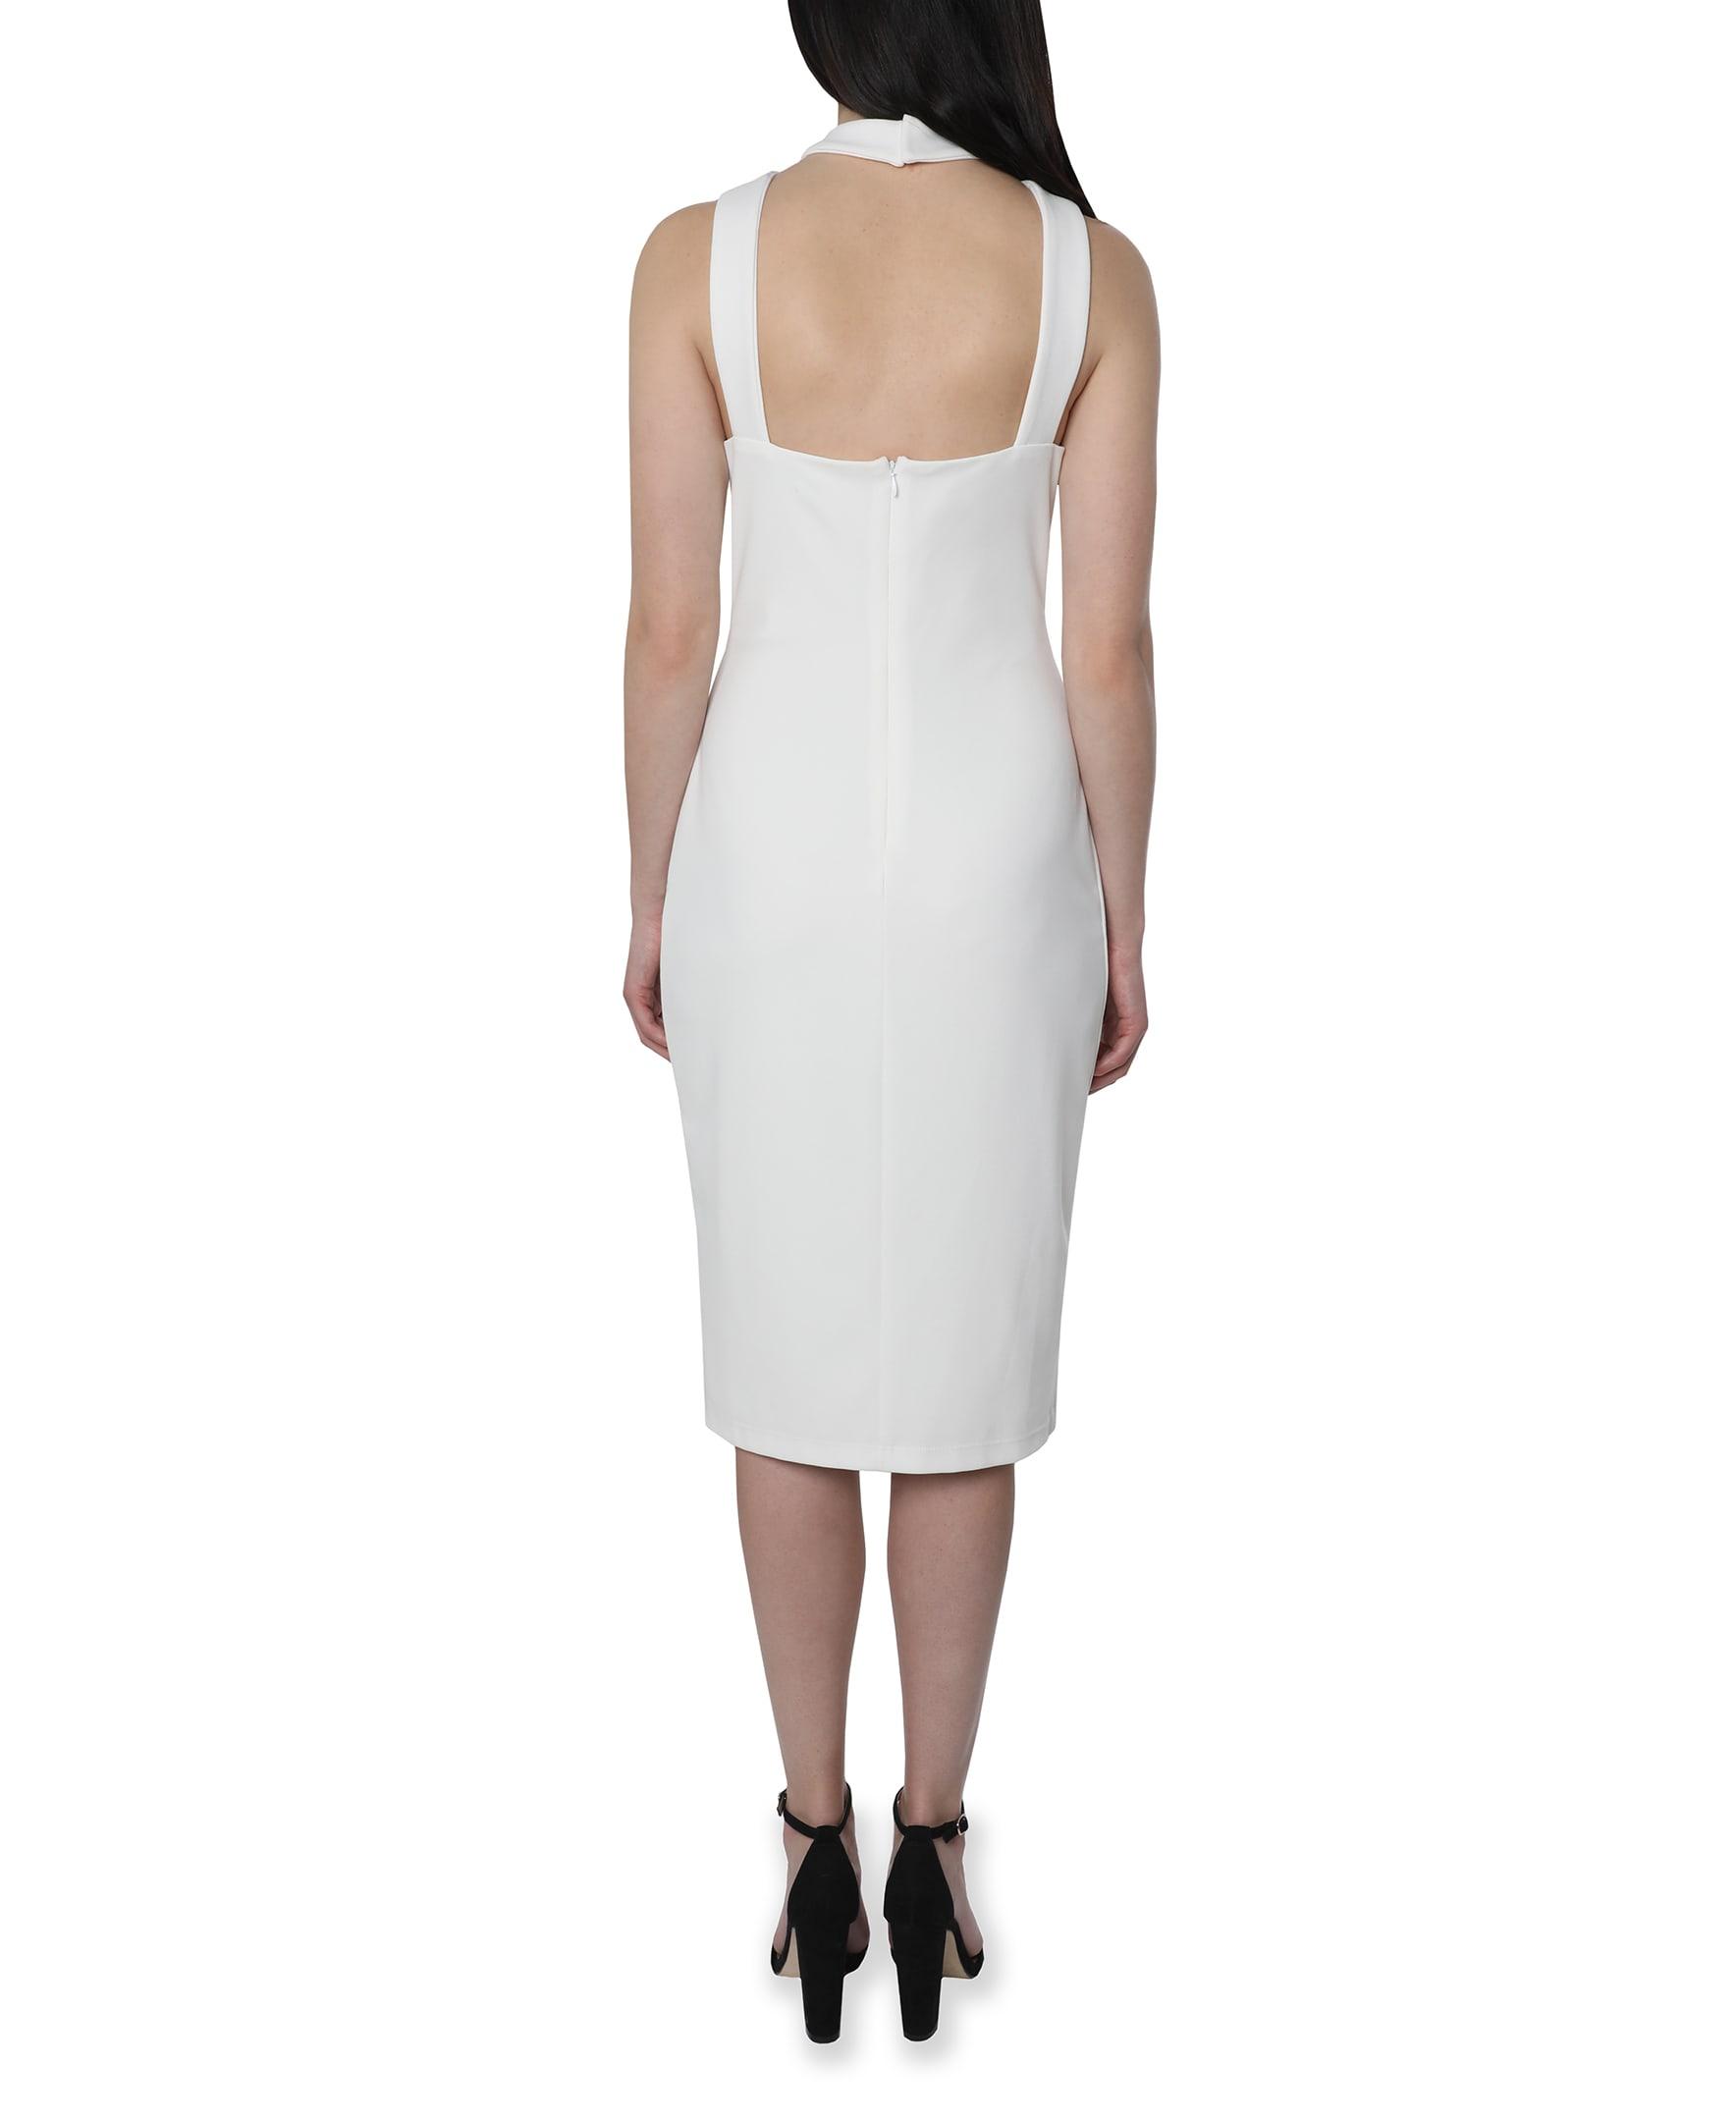 Bebe Halter Neck Midi Dress - Ivory - Back